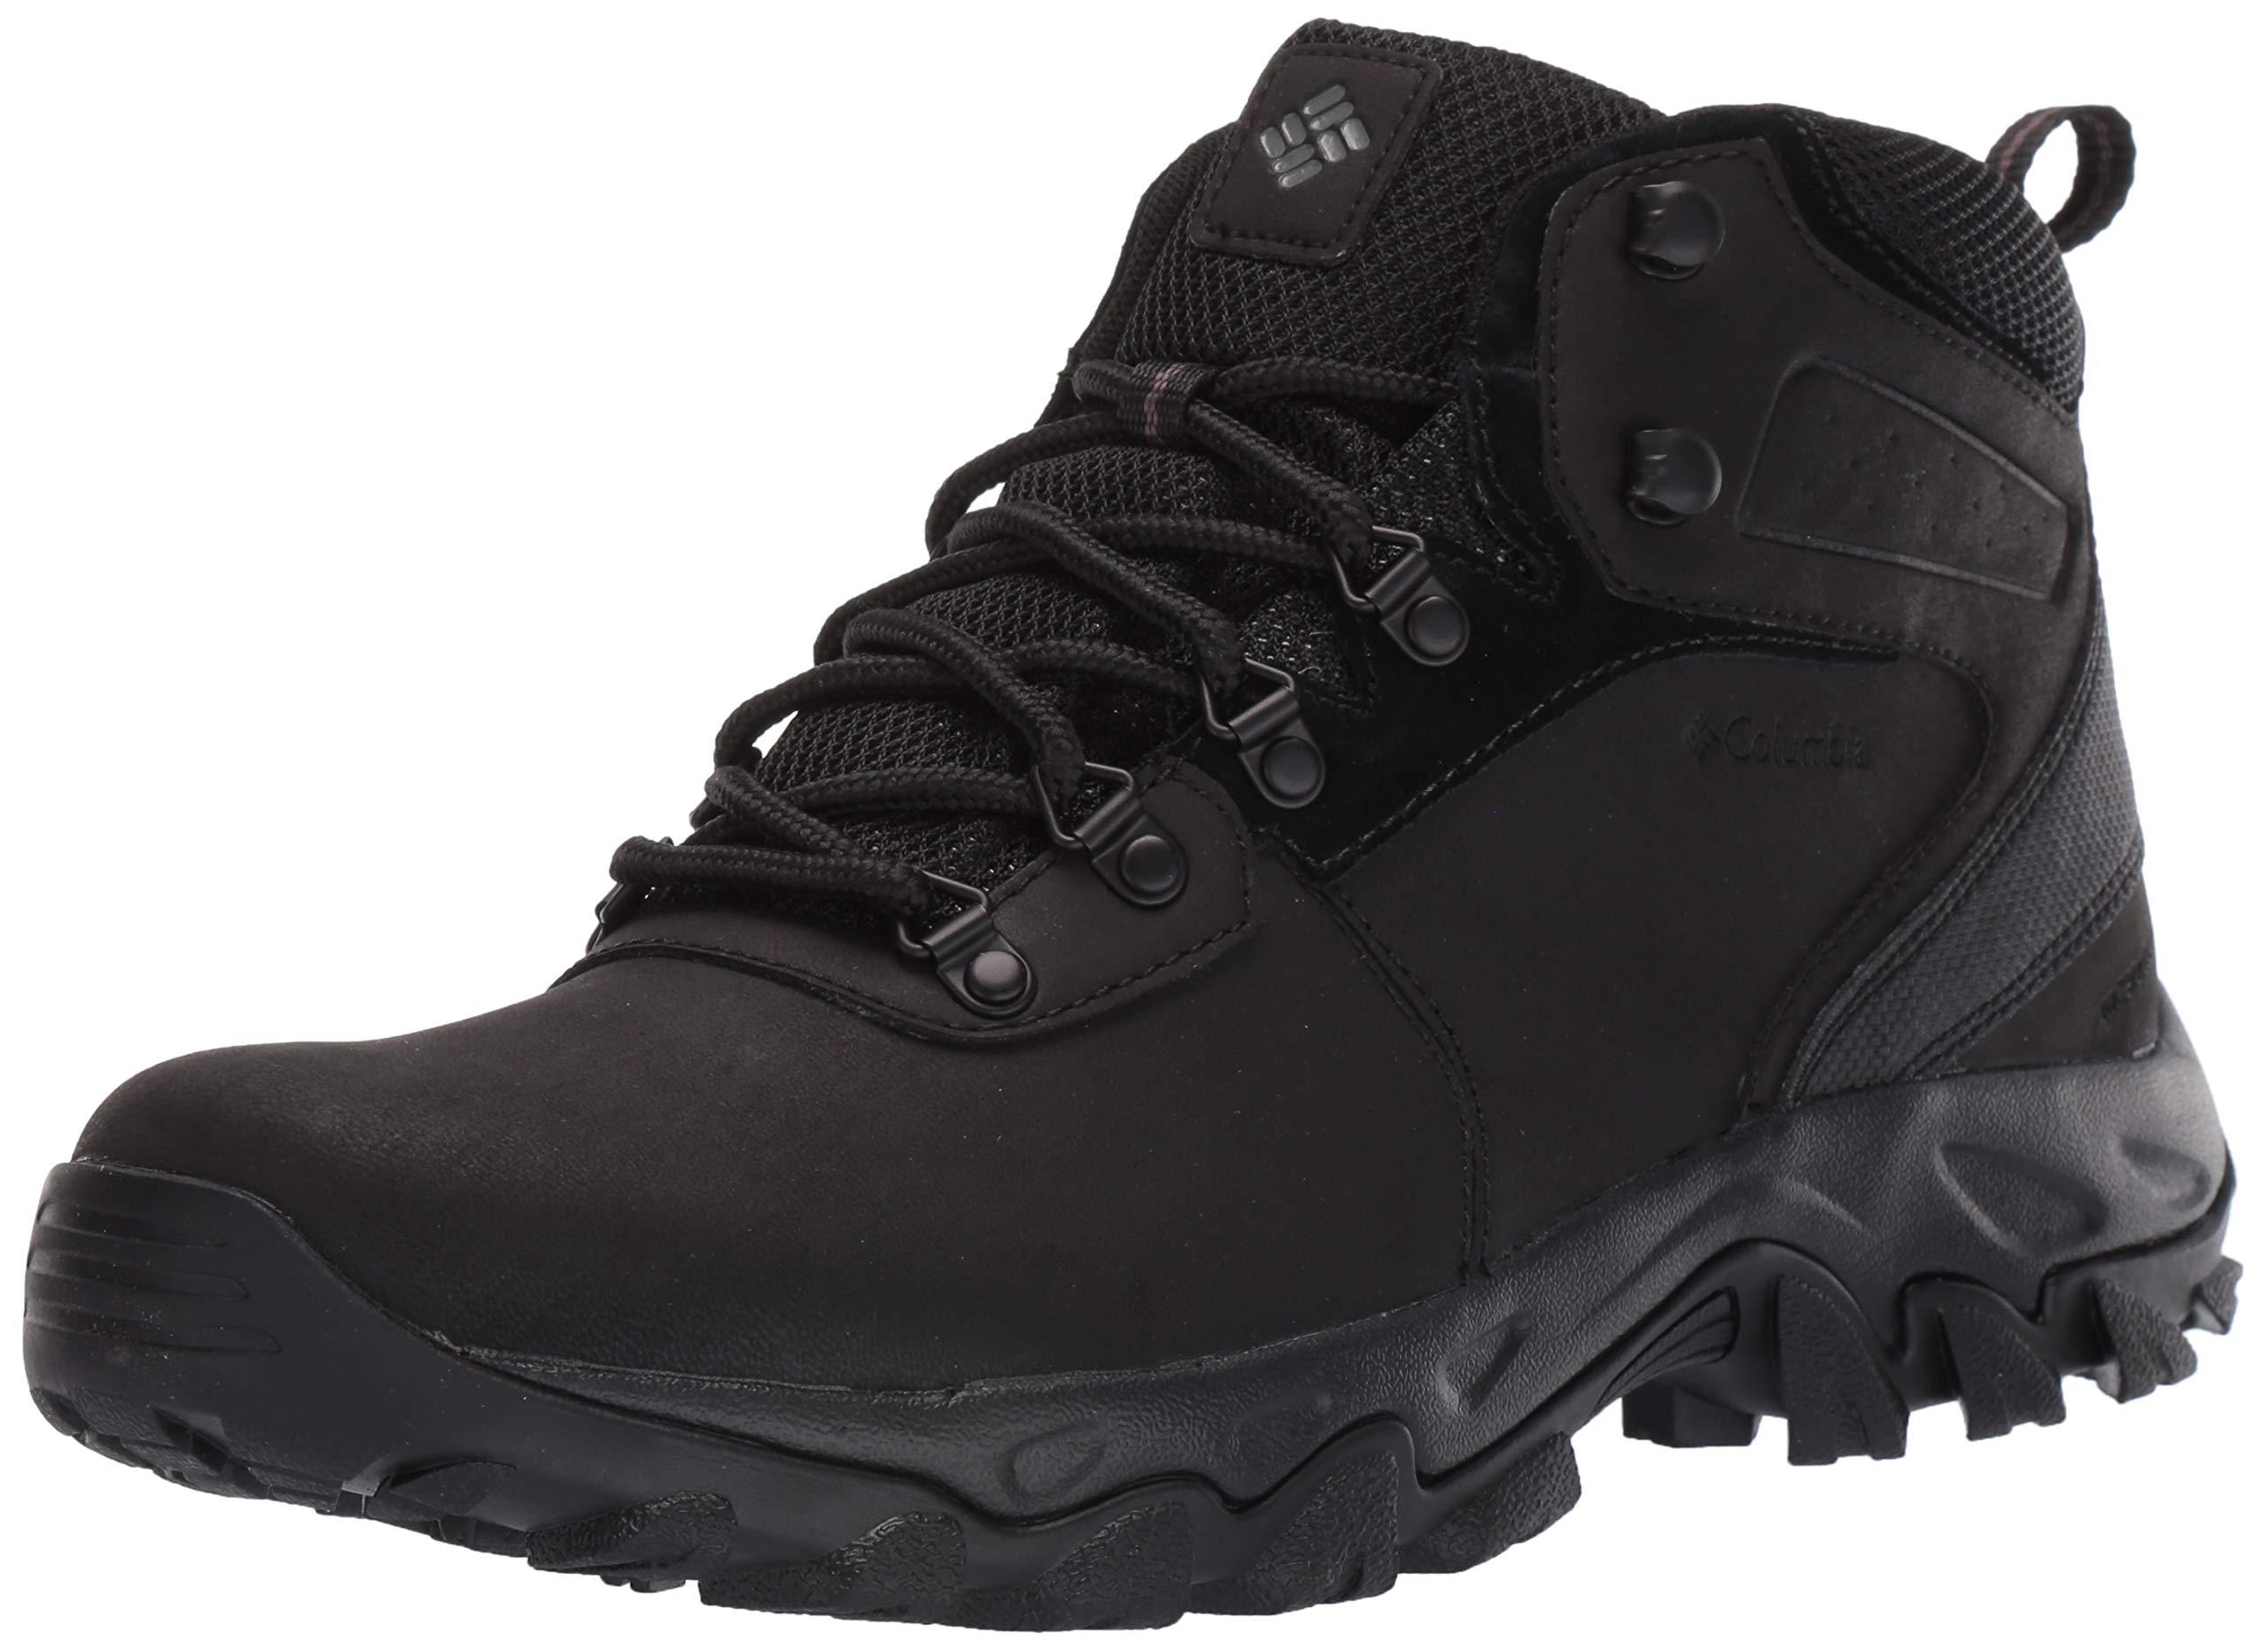 Columbia Men's Newton Ridge Plus II Waterproof Hiking Boot Black, 7 Regular US